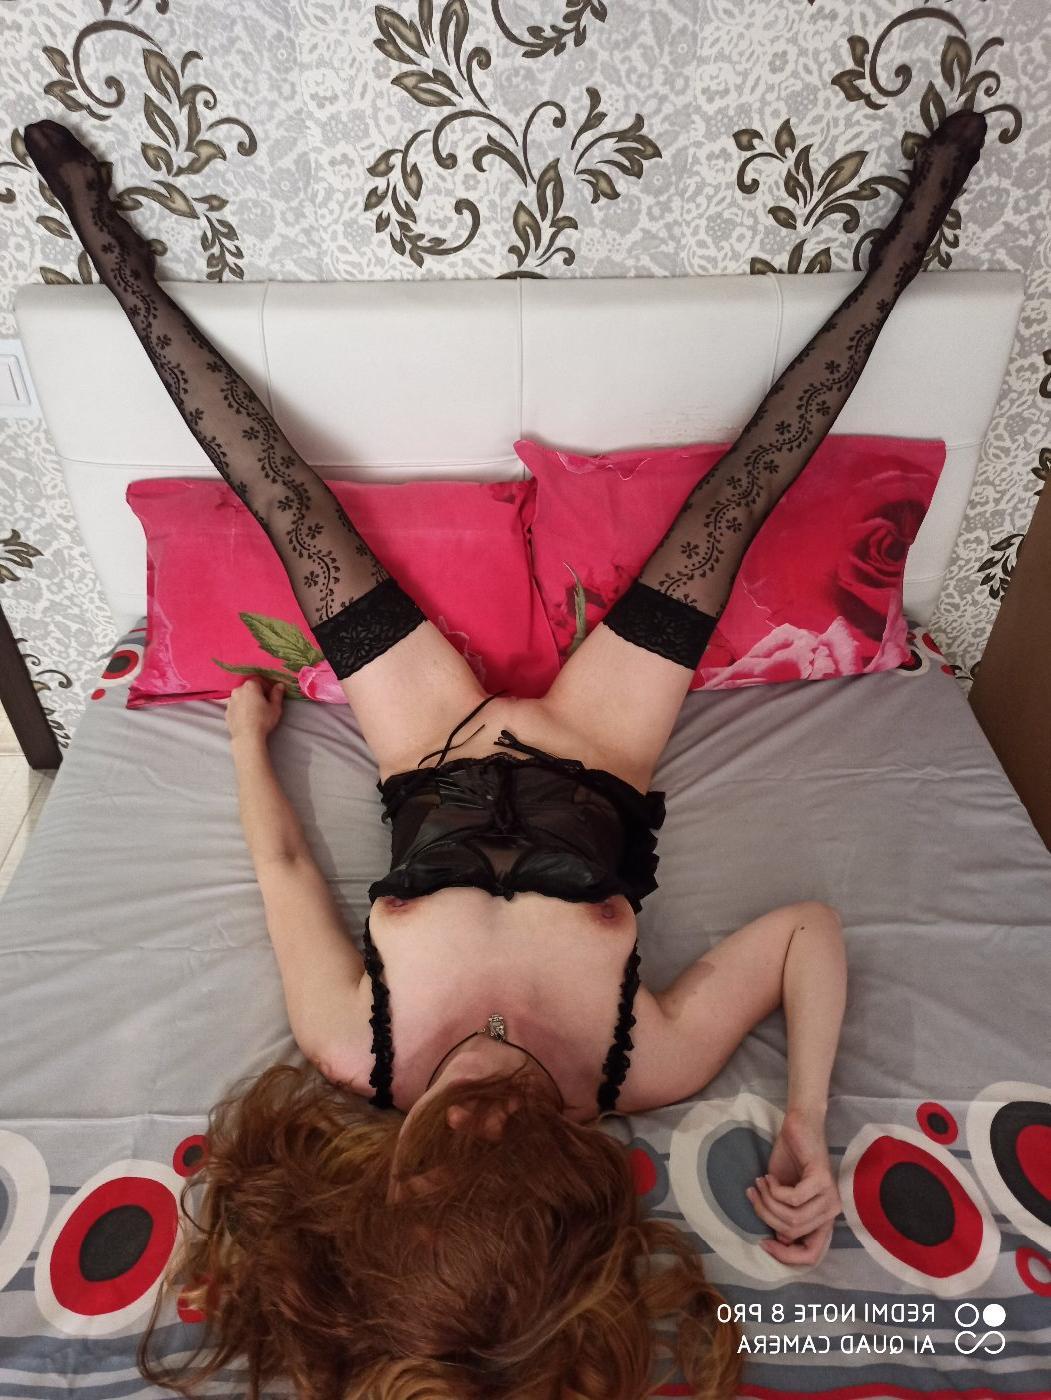 Проститутка Вероника Армей, 29 лет, метро Кузнецкий мост